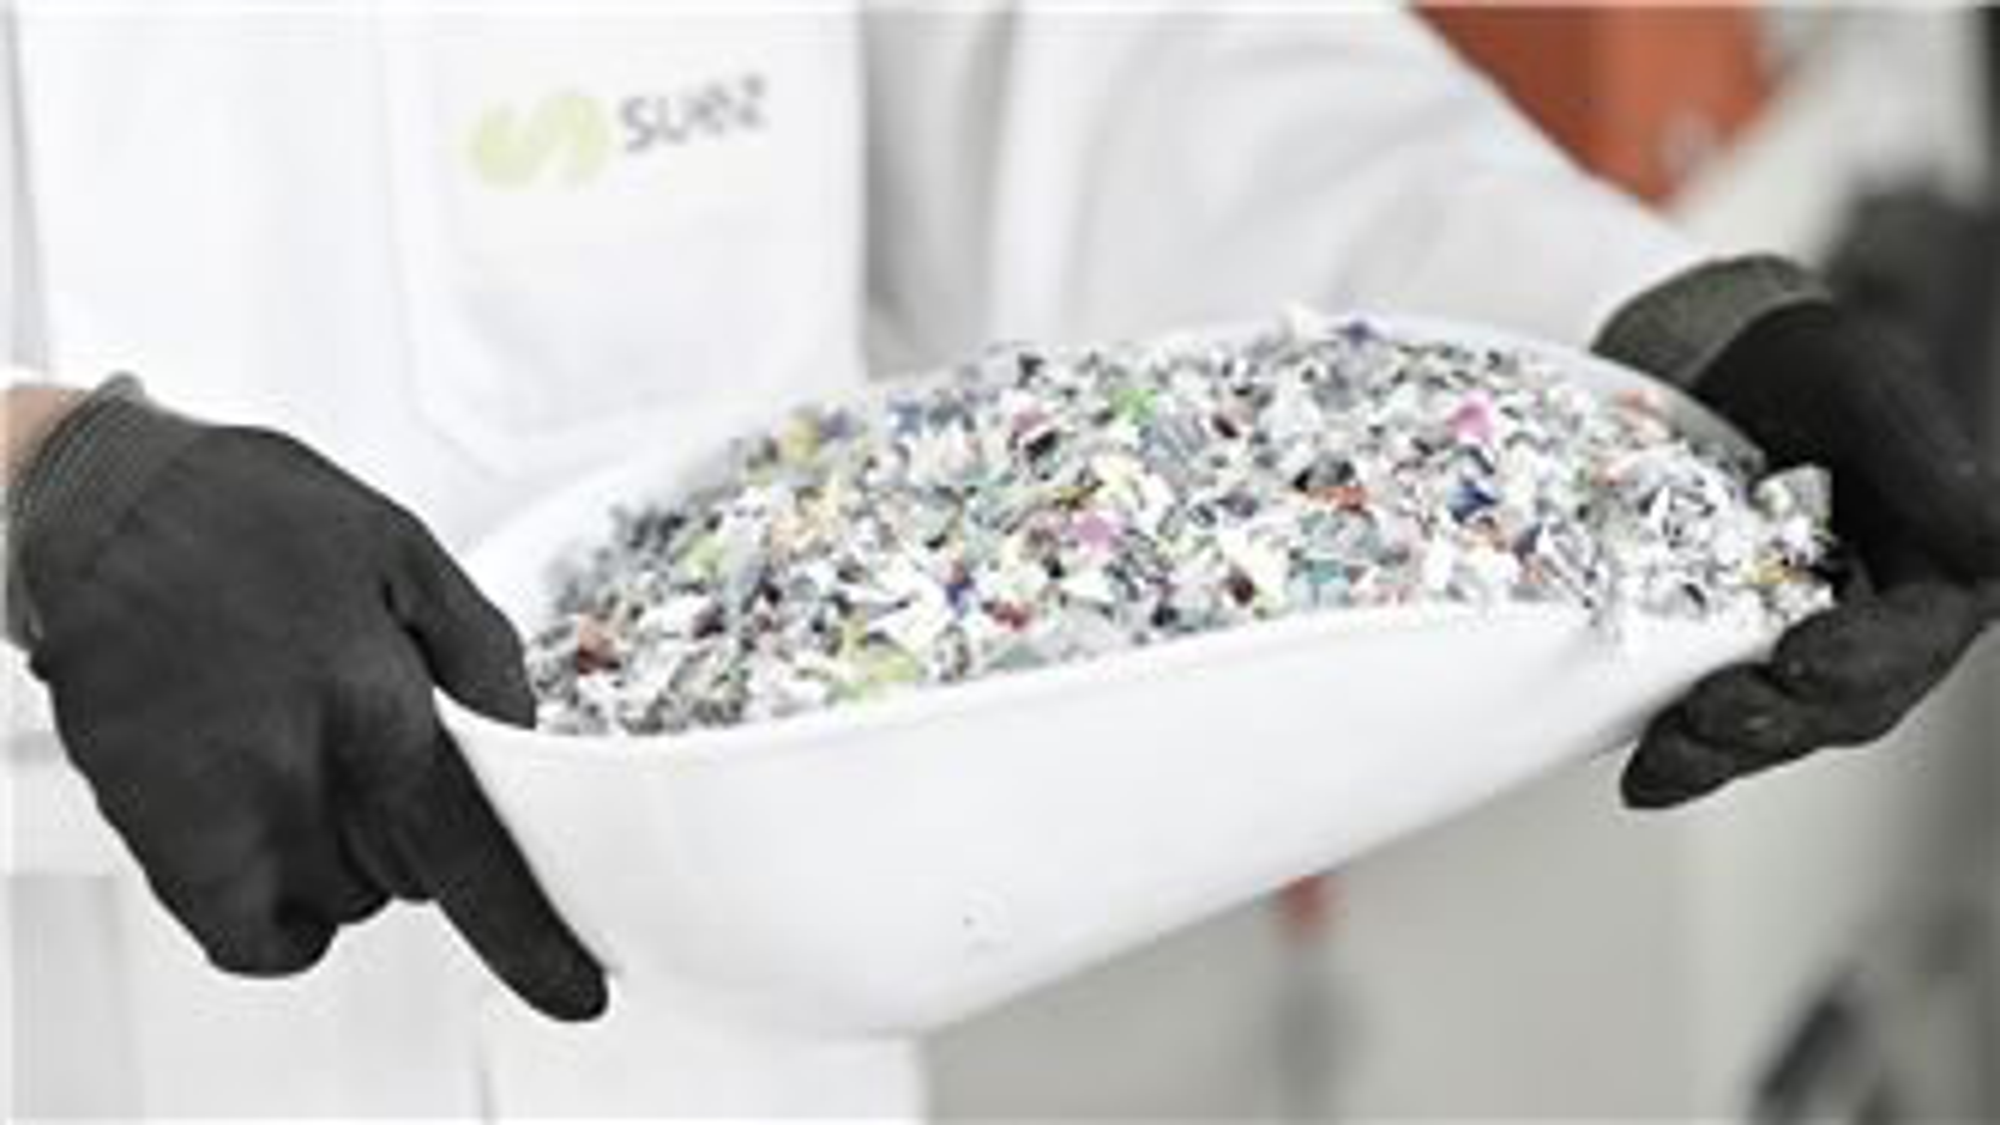 SUEZ laboratory Plast lab recycled plastic